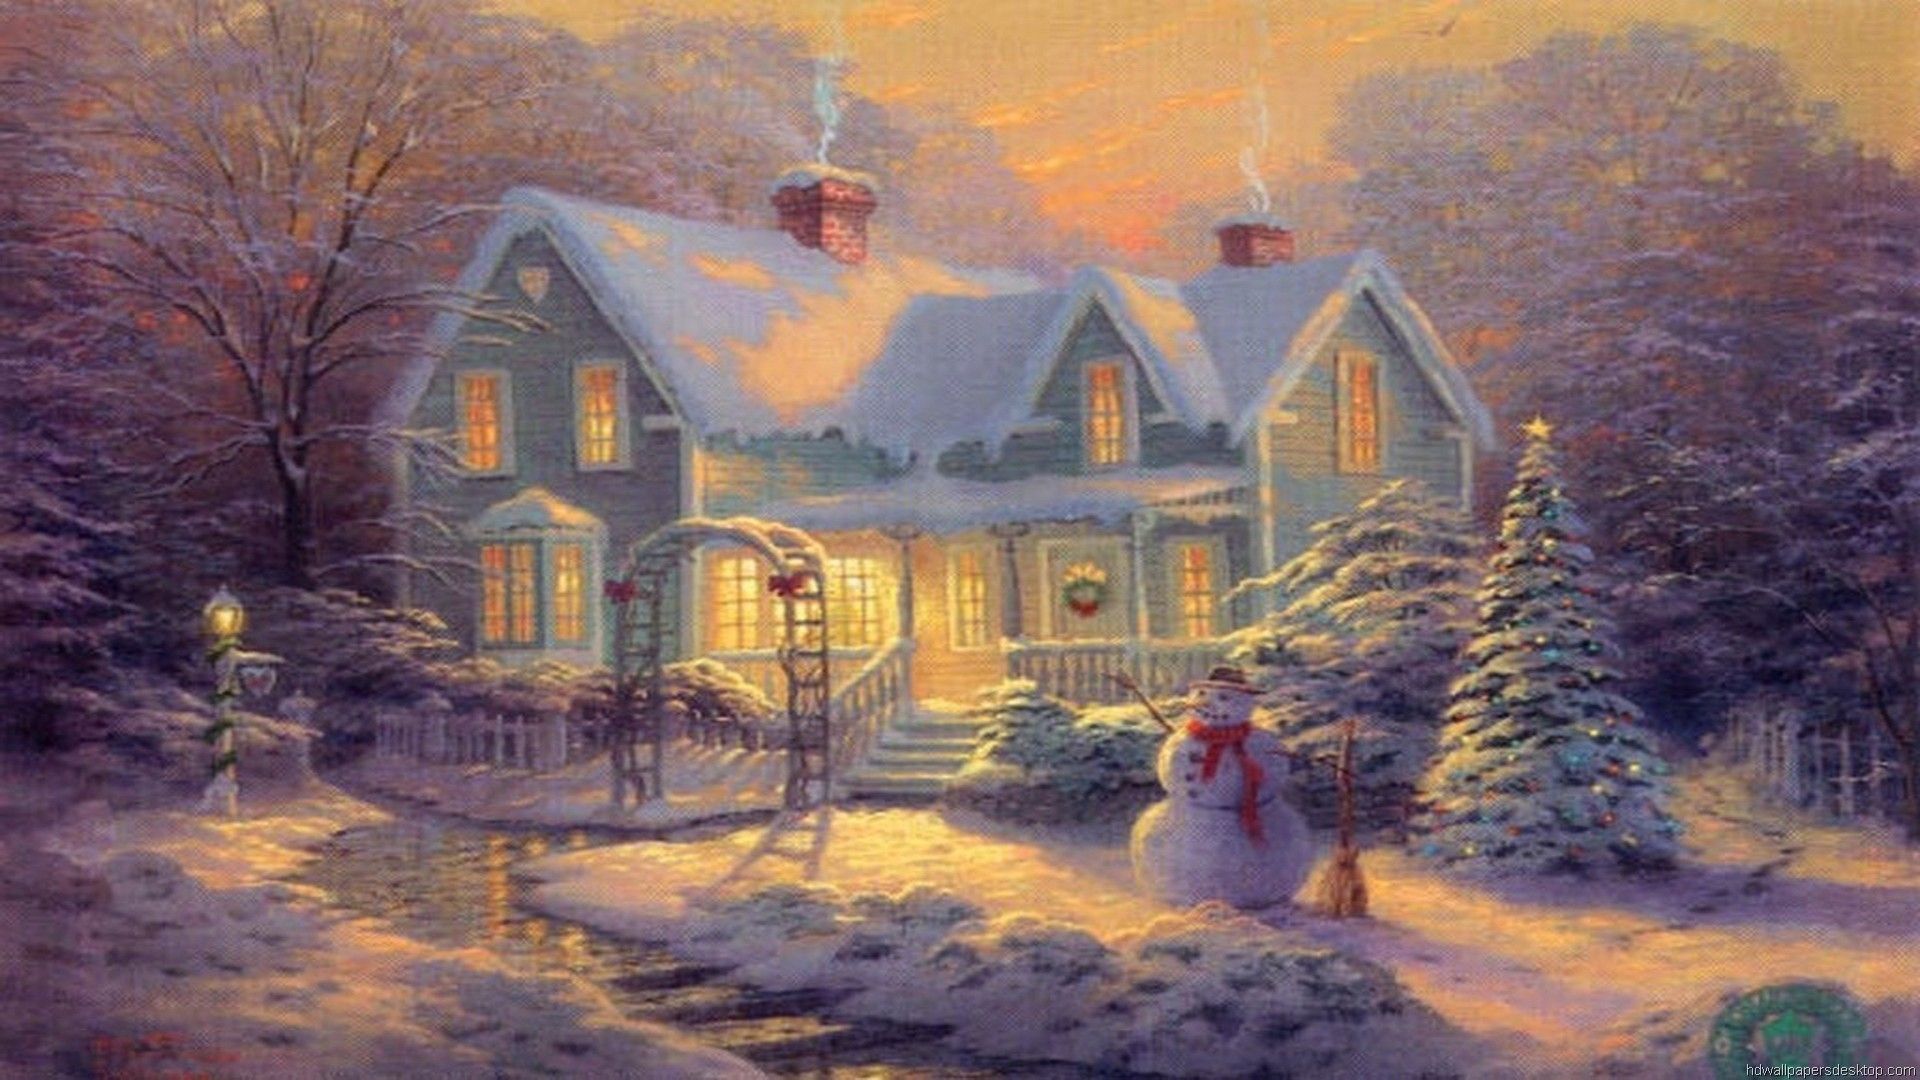 Thomas Kinkade Winter Wallpaper